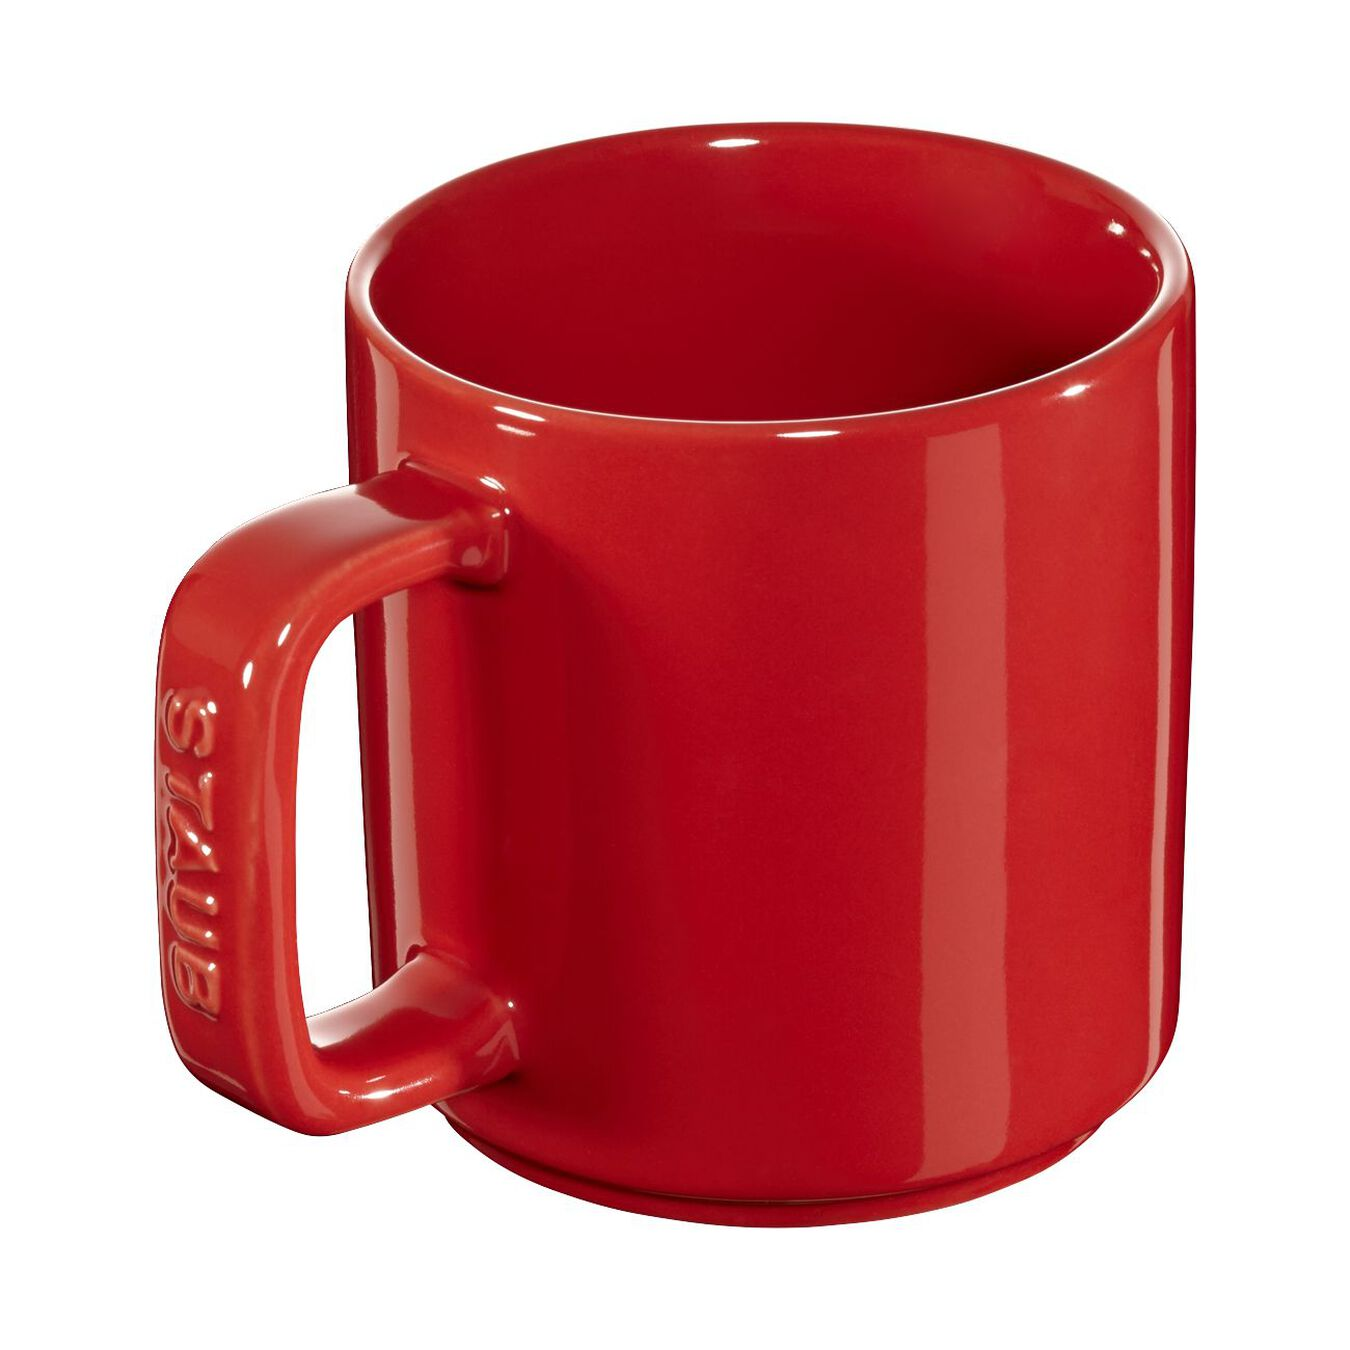 Mugs 200 ml / 2-pcs,,large 1